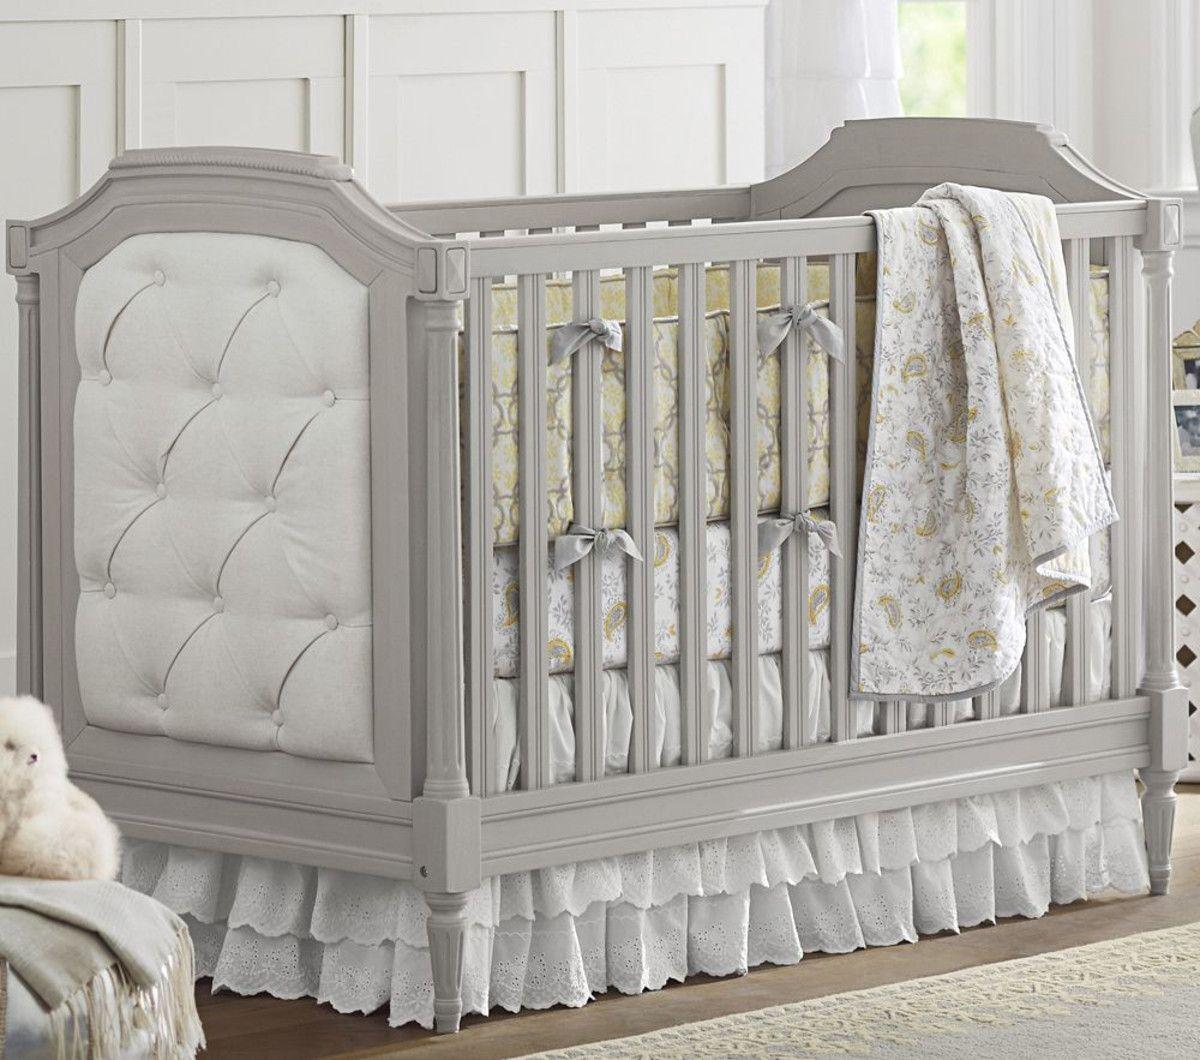 the blythe crib from pottery barn kids nursery - Pottery Barn Babies Room